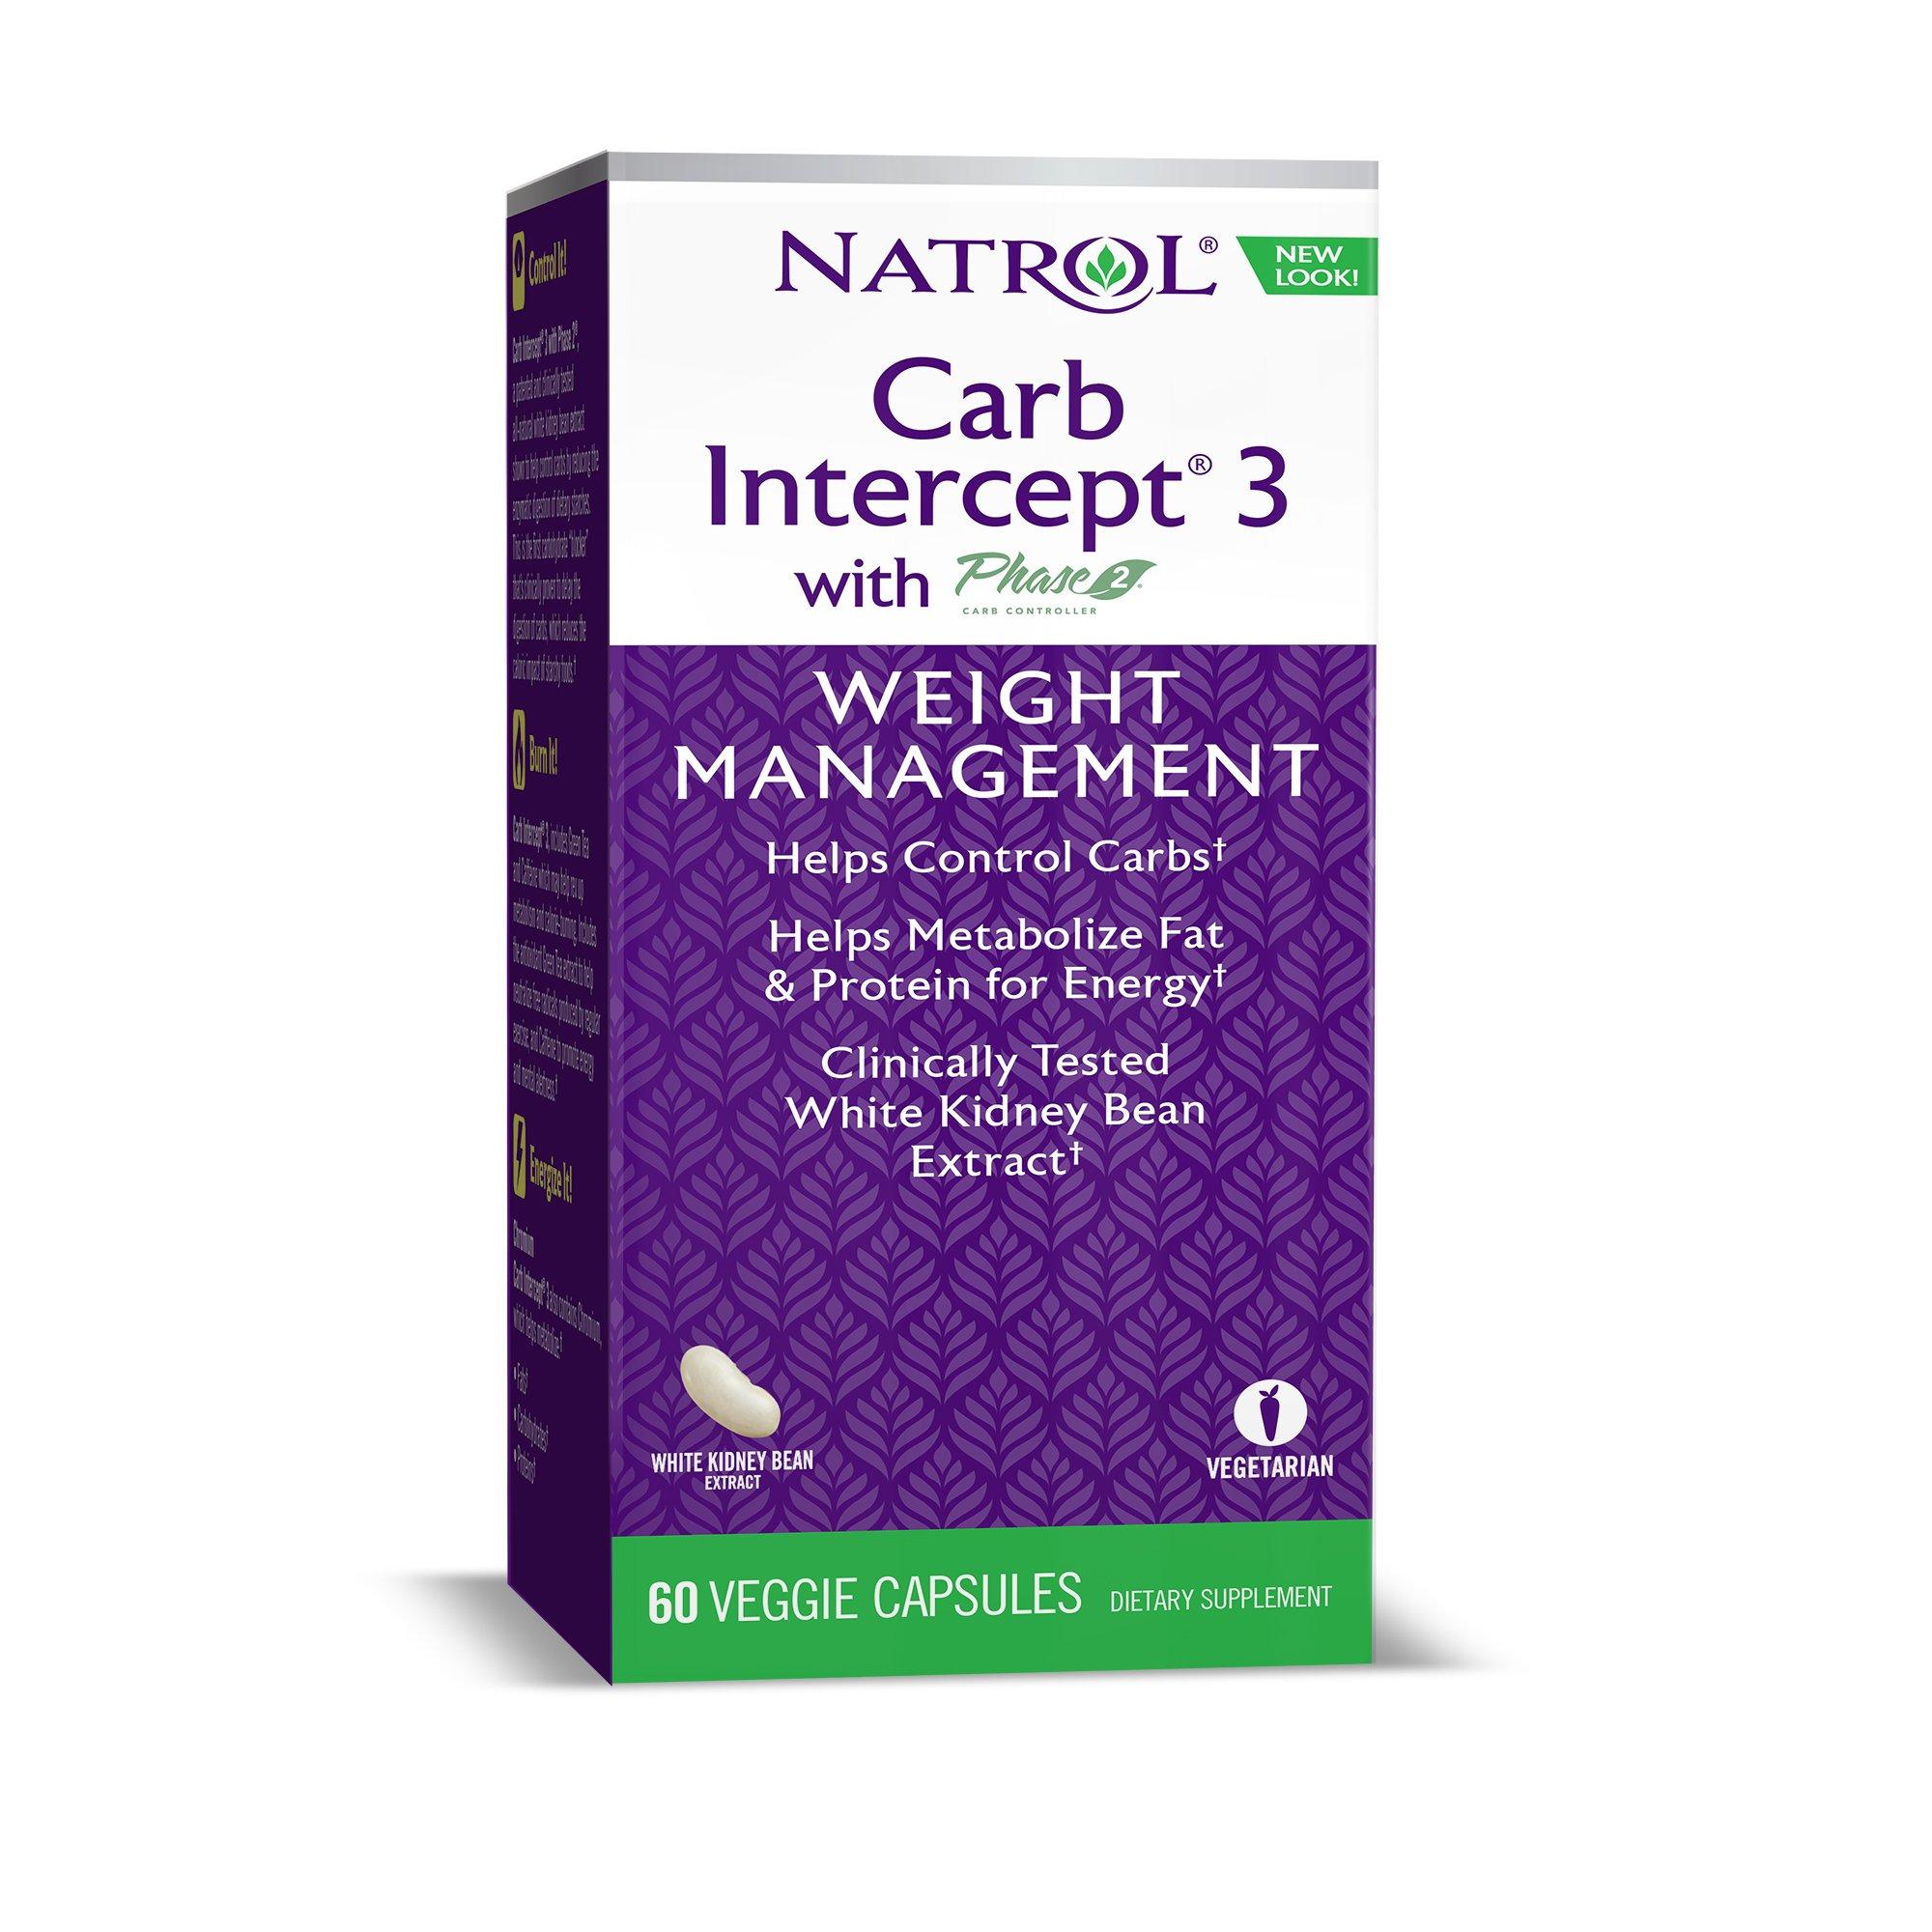 Natrol Carb Intercept 3 Capsules, 60 Count by Natrol